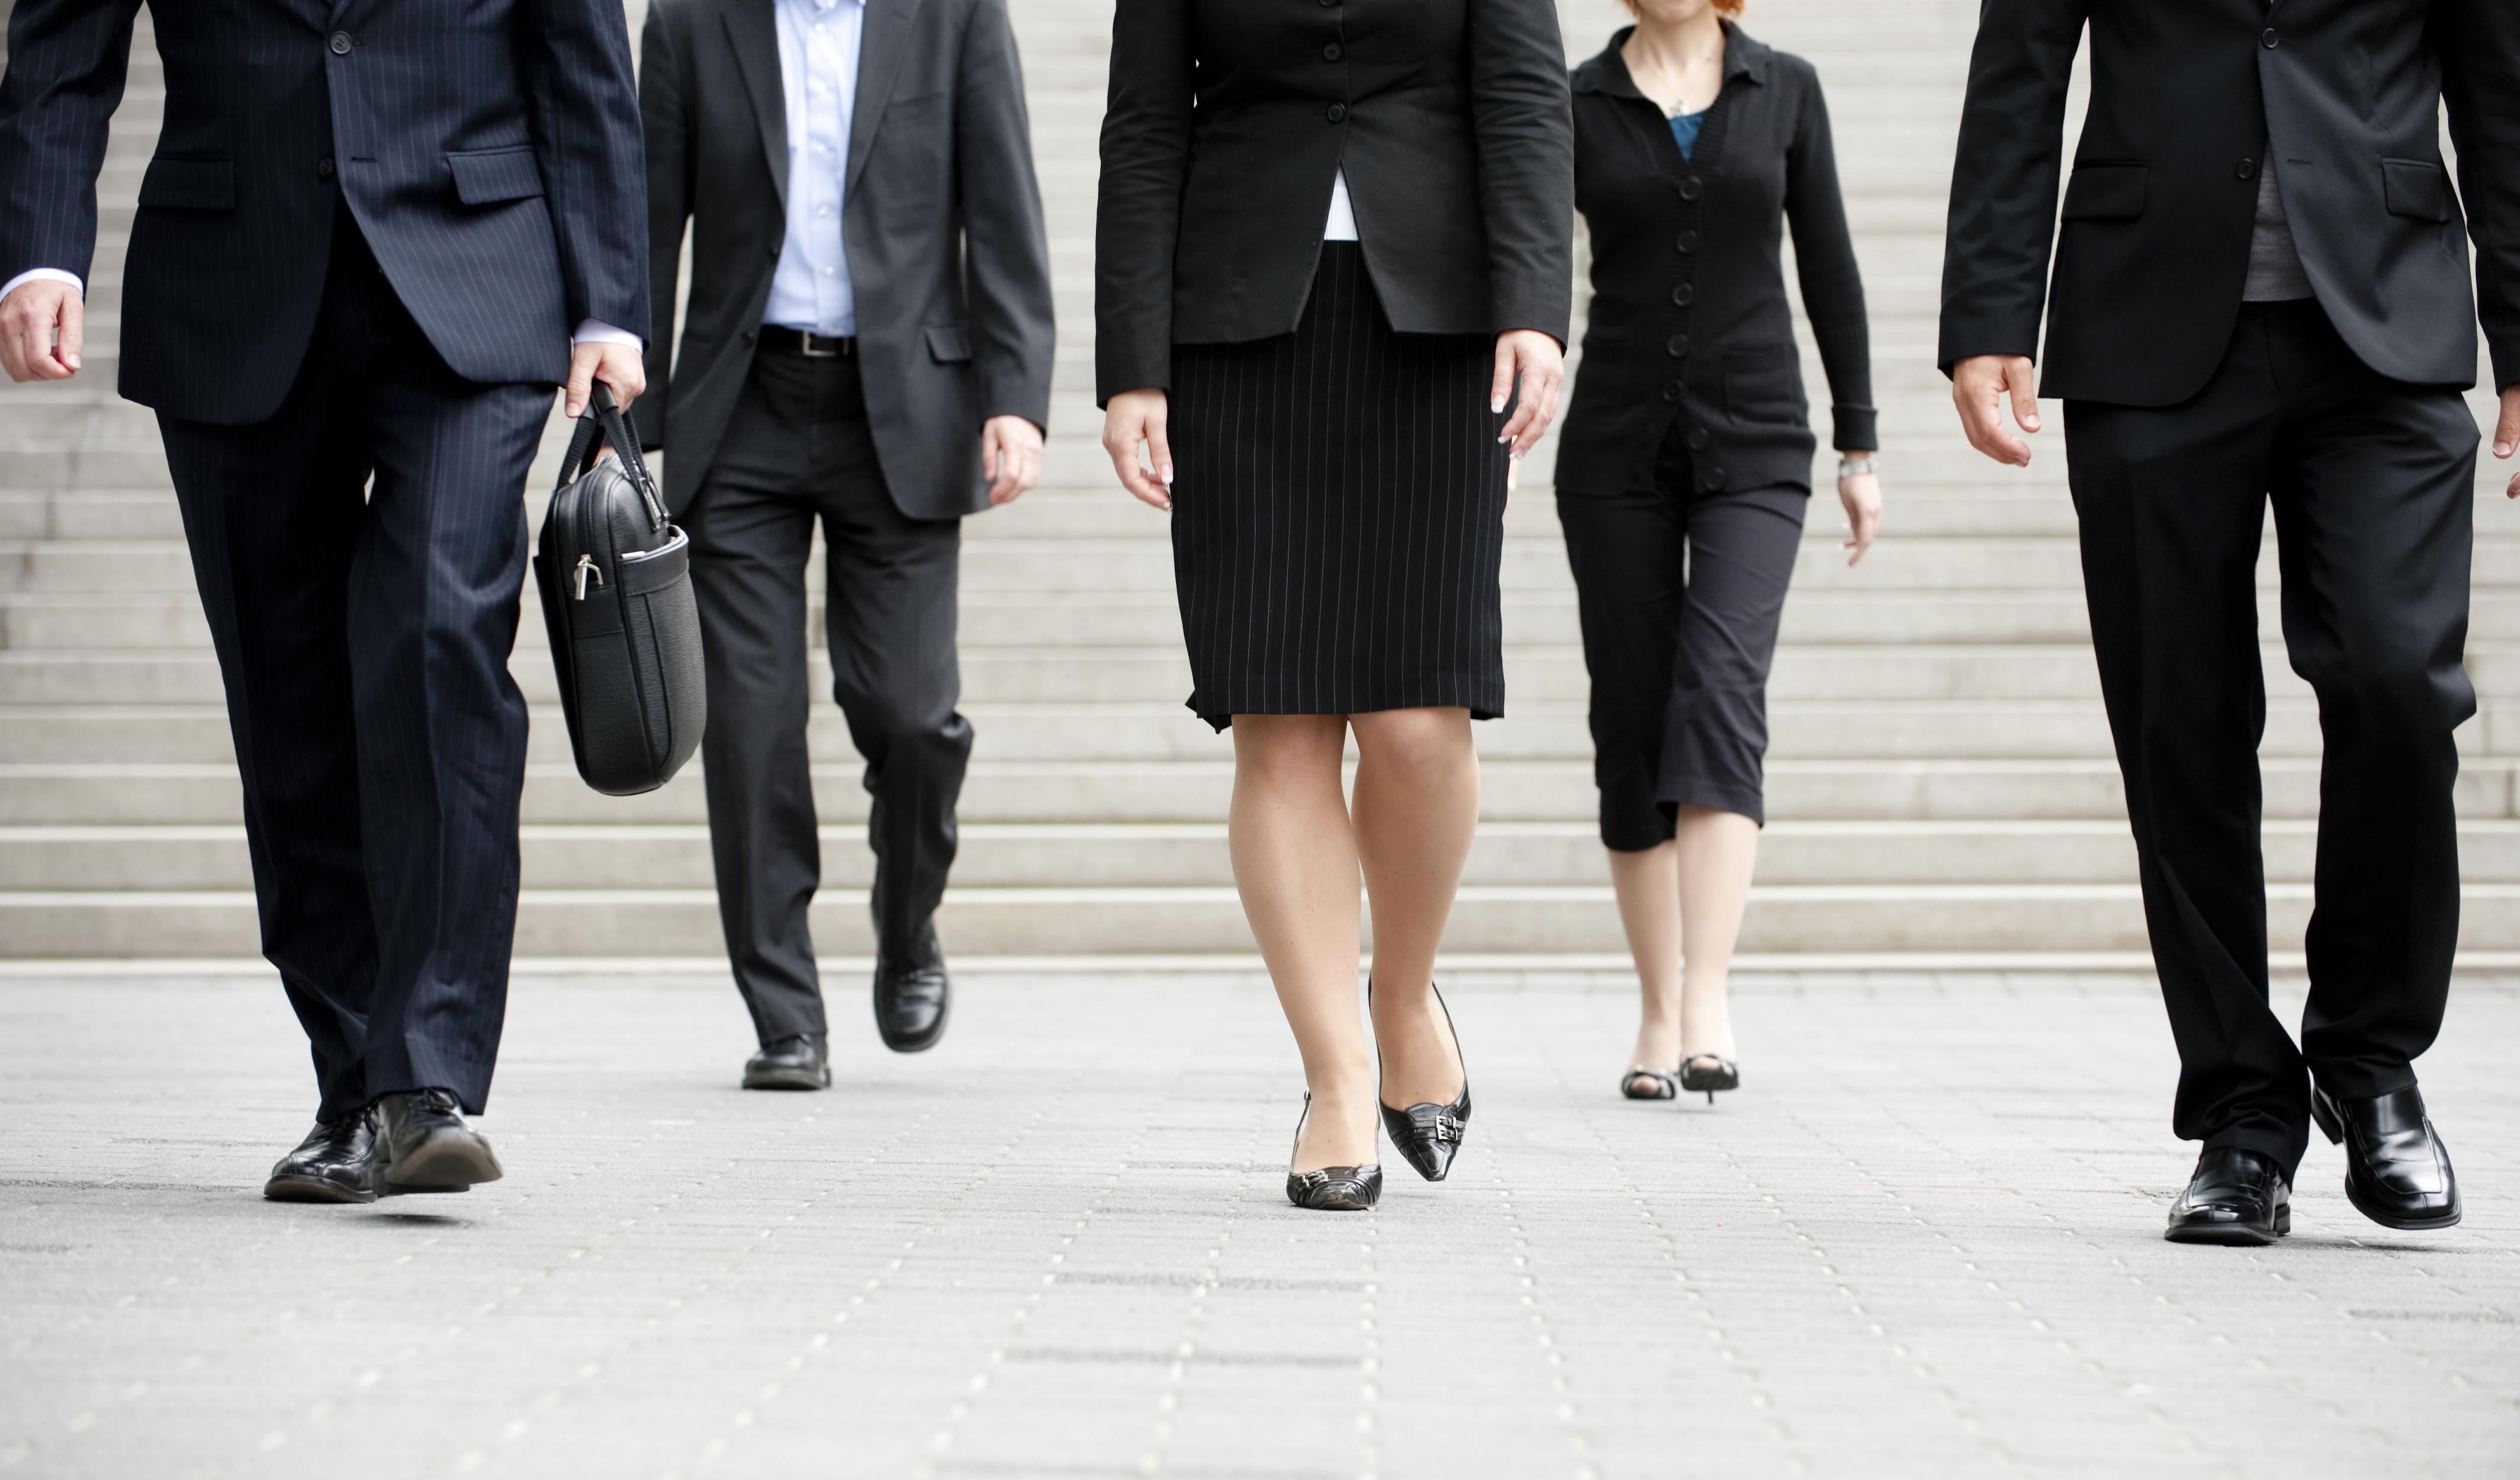 walking-business